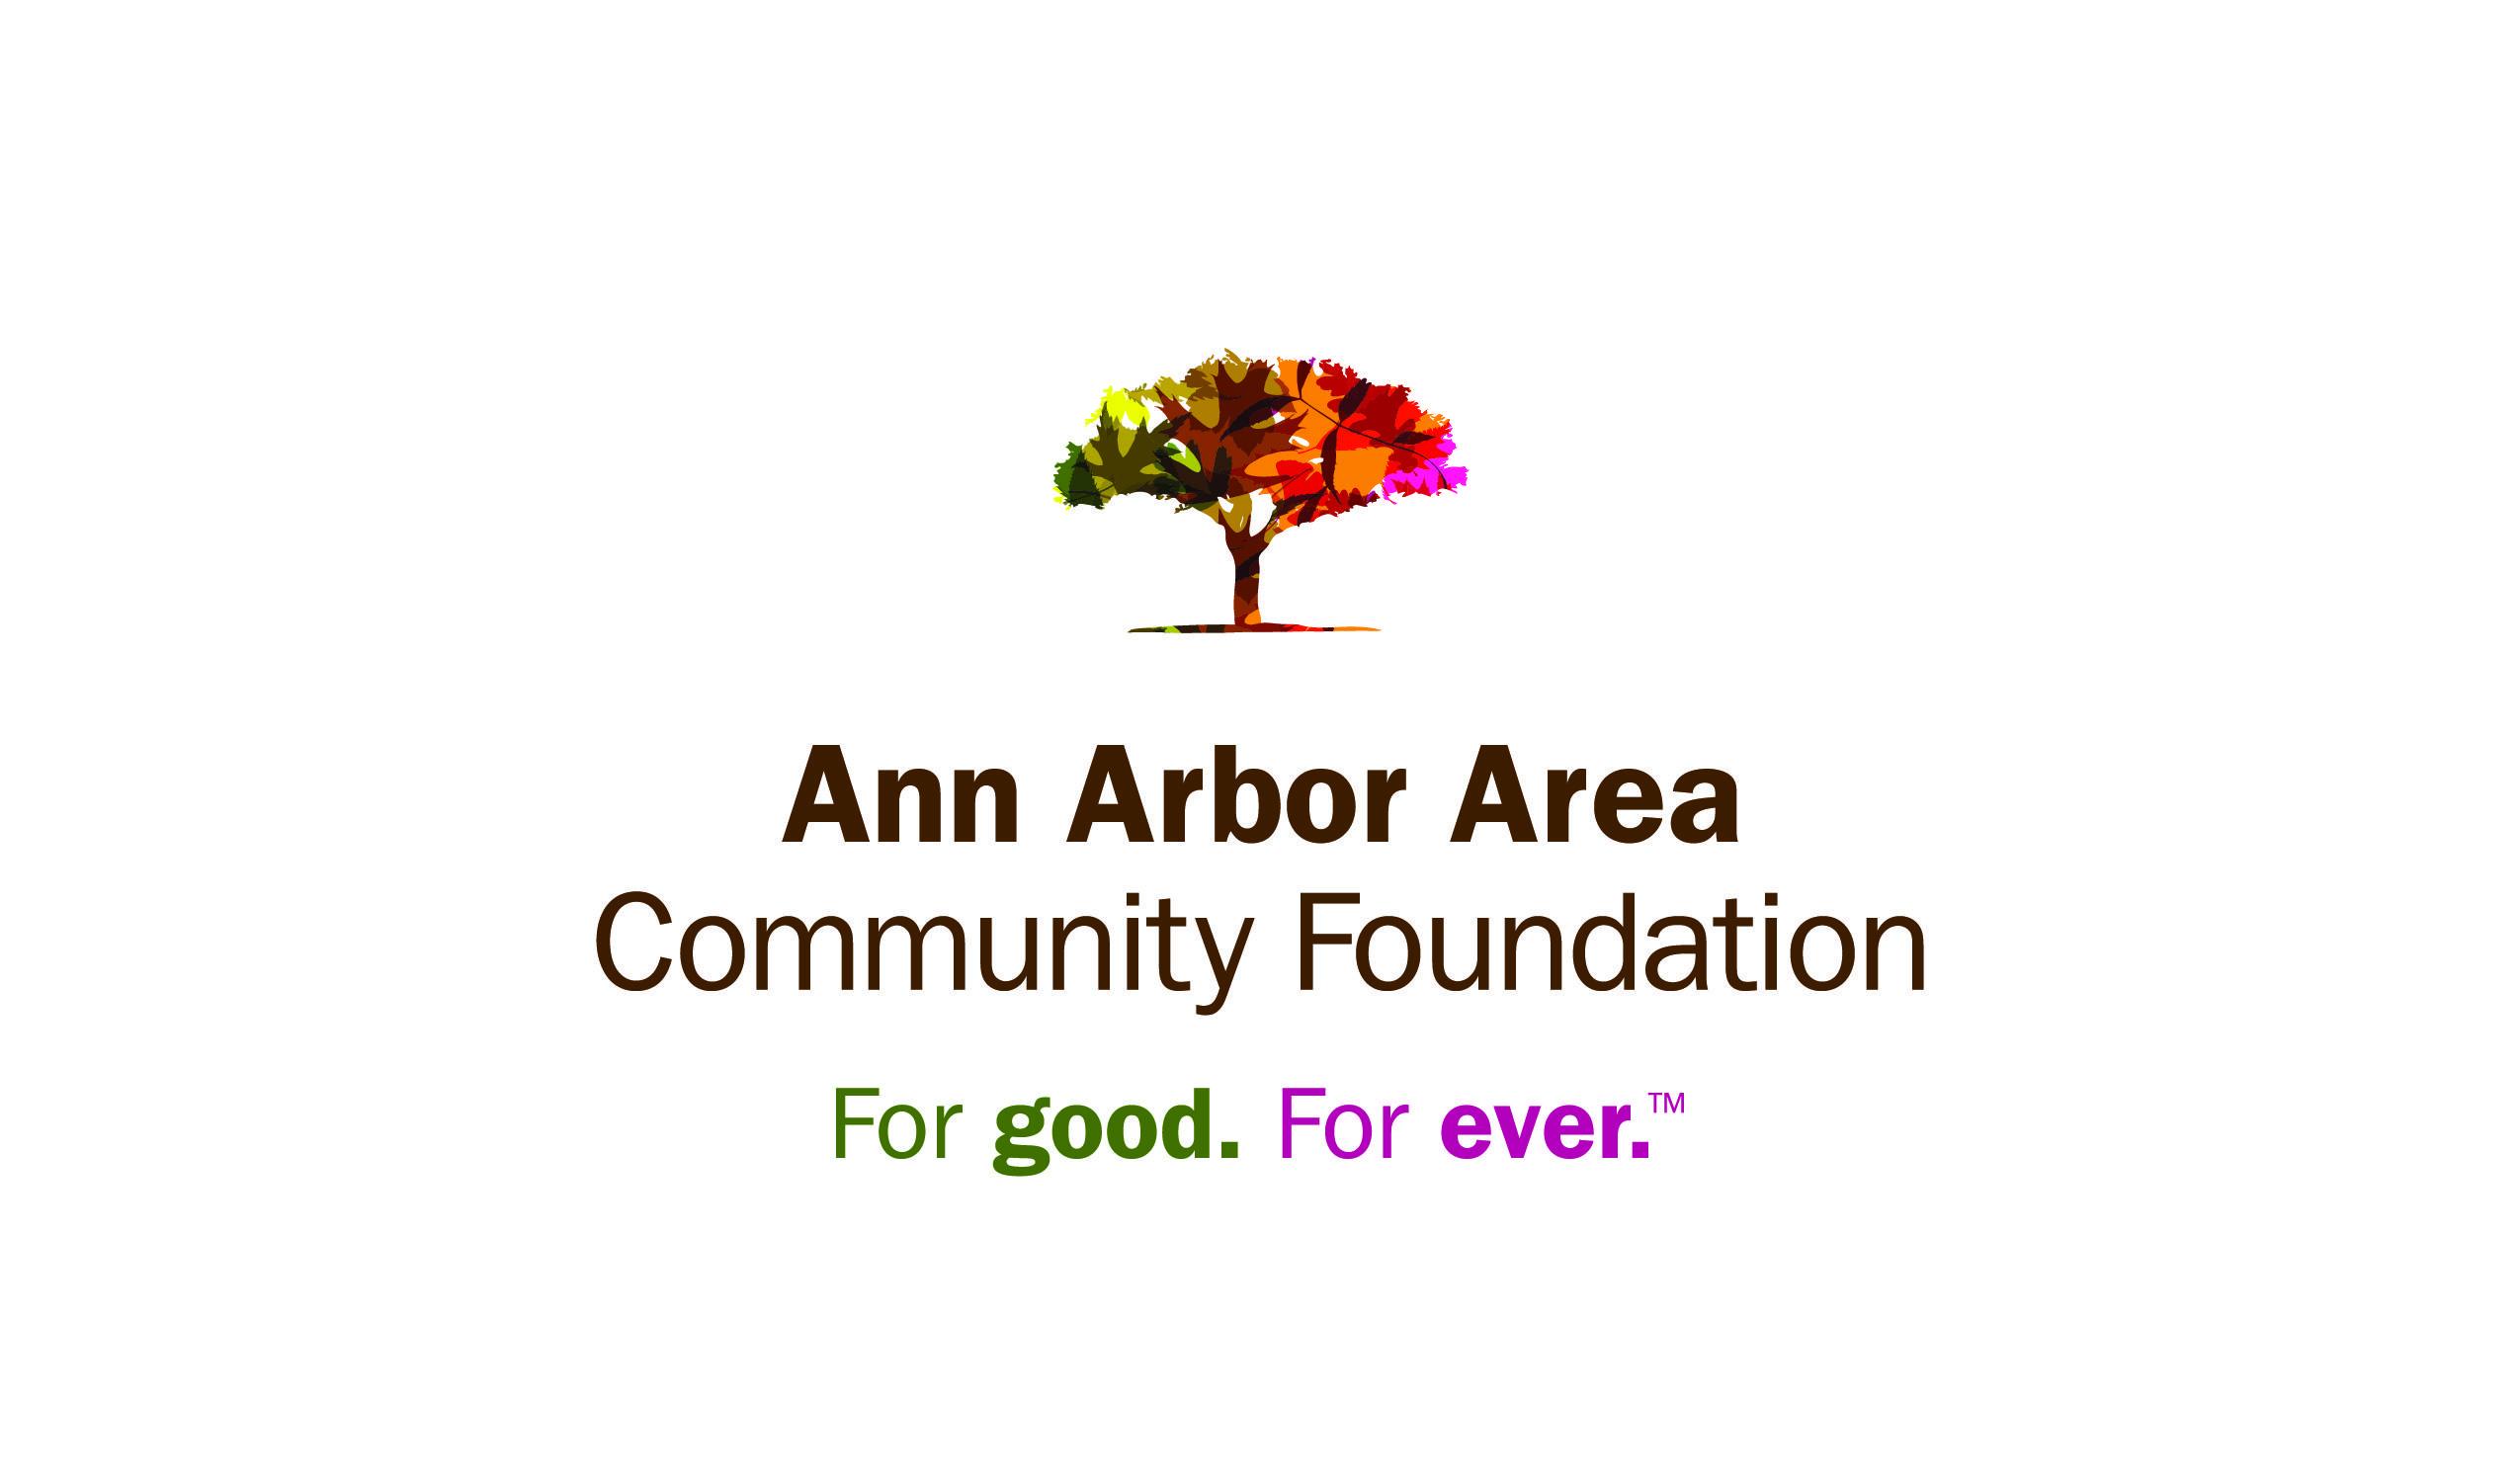 2017 Community Grantmaking Info Session No. 1